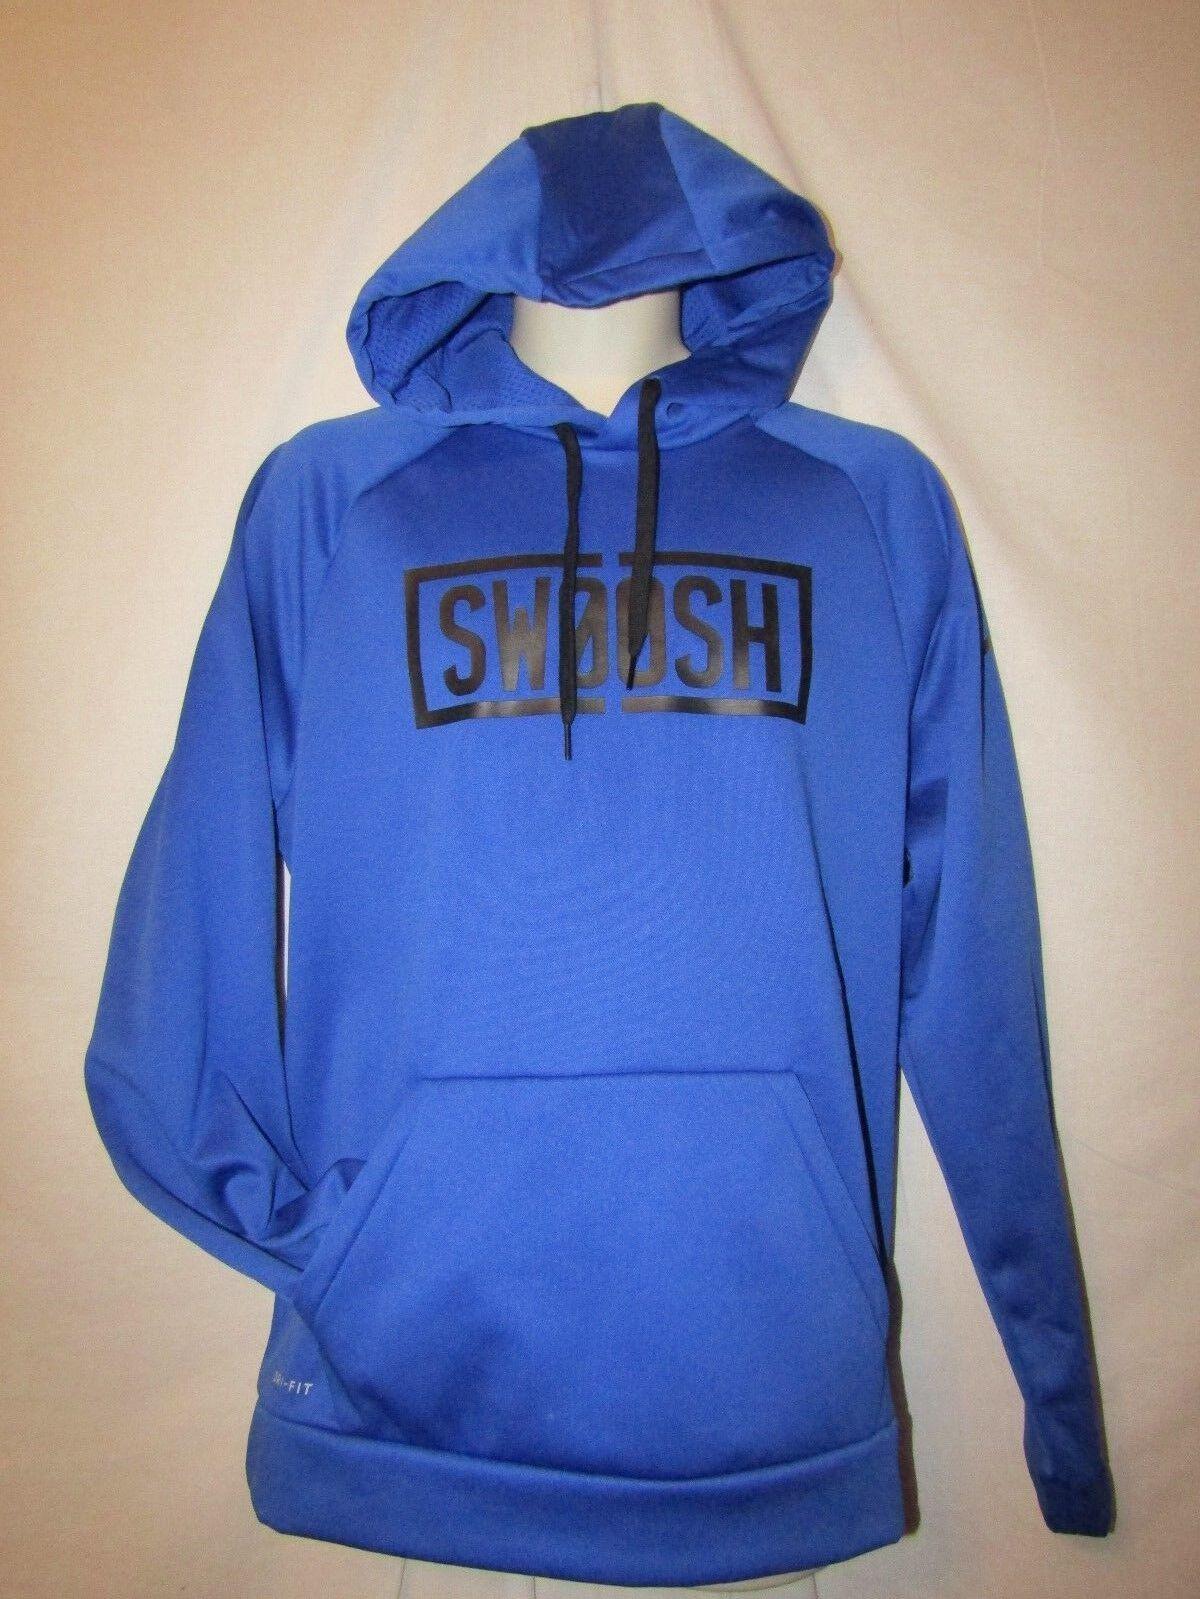 Mens nike swish therma dri fit hoodie L nwt bluee